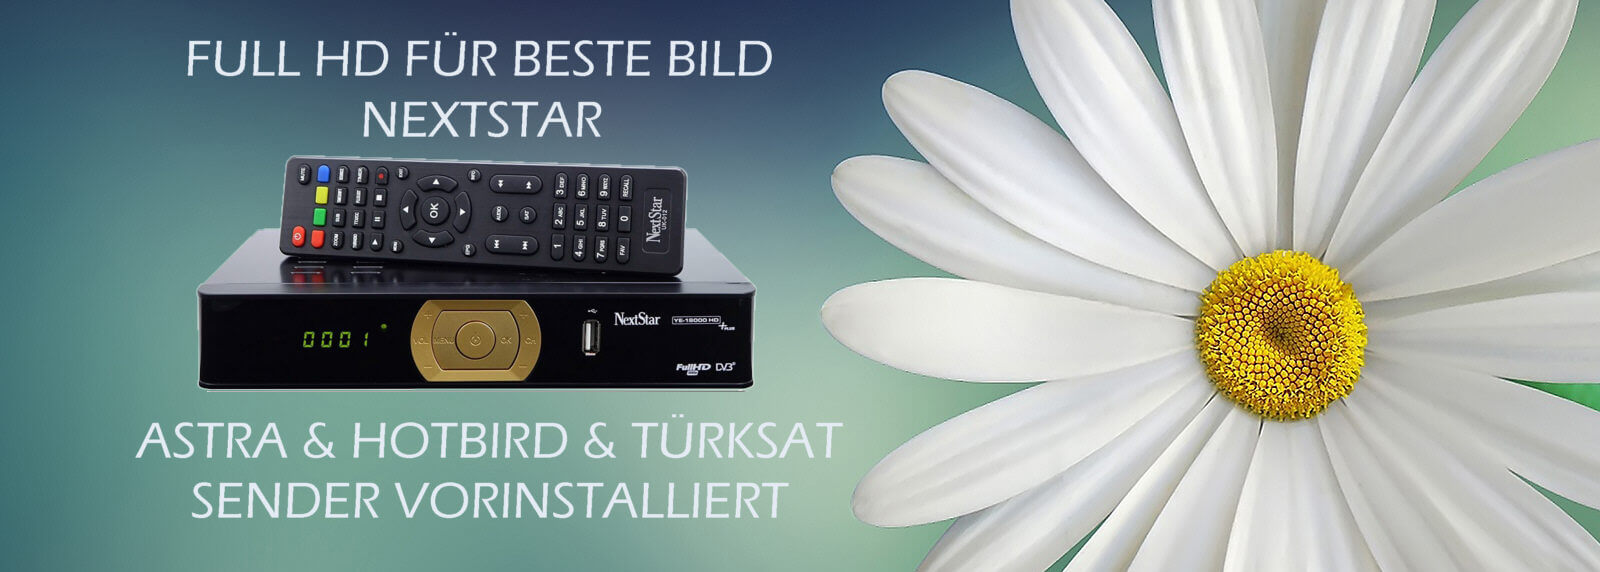 NEXT YE-18000 HDTV PLUS Sat-Receiver